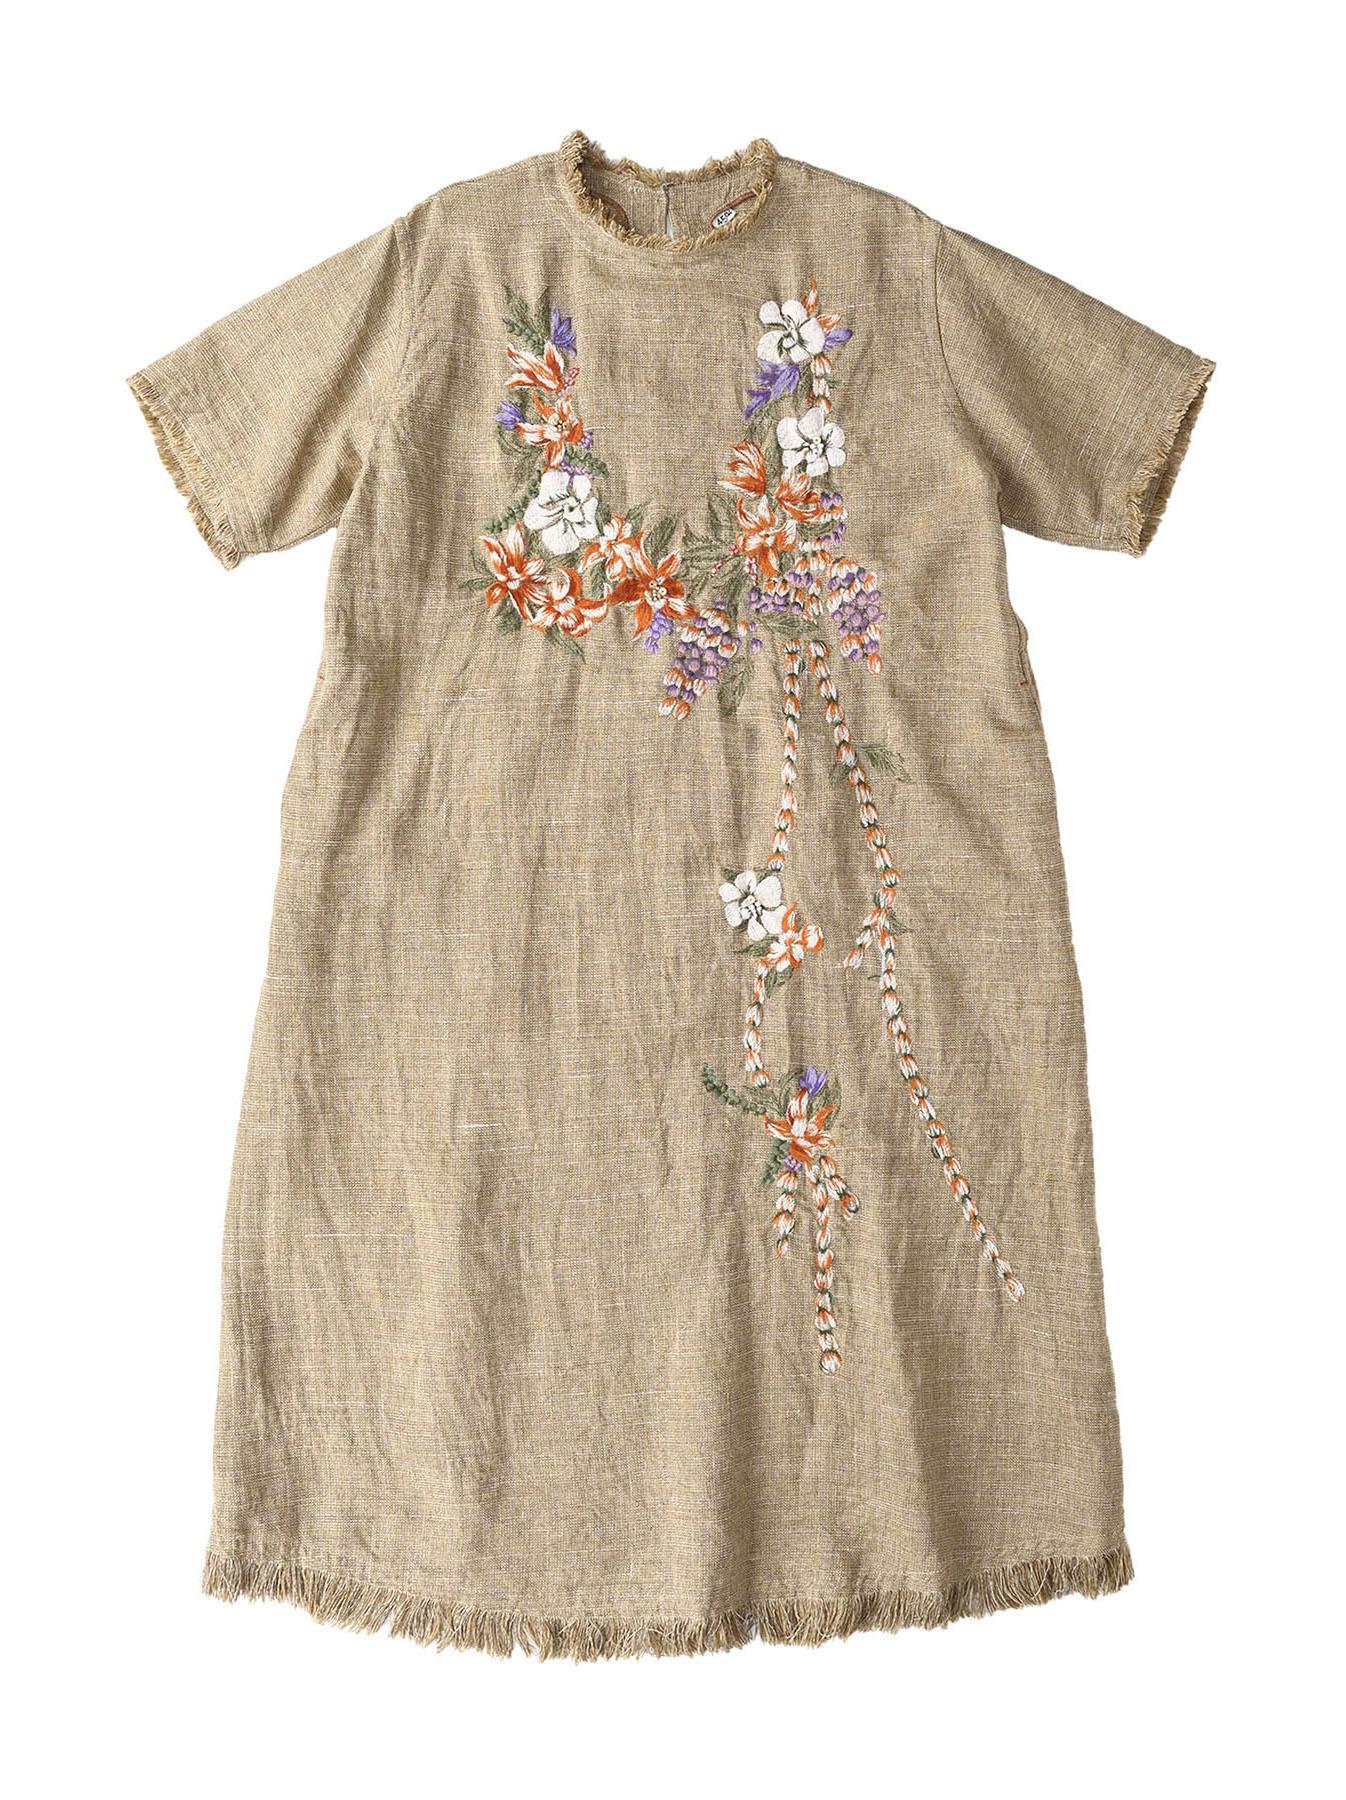 Gima Tweed Leilei Embroidery Dress-1